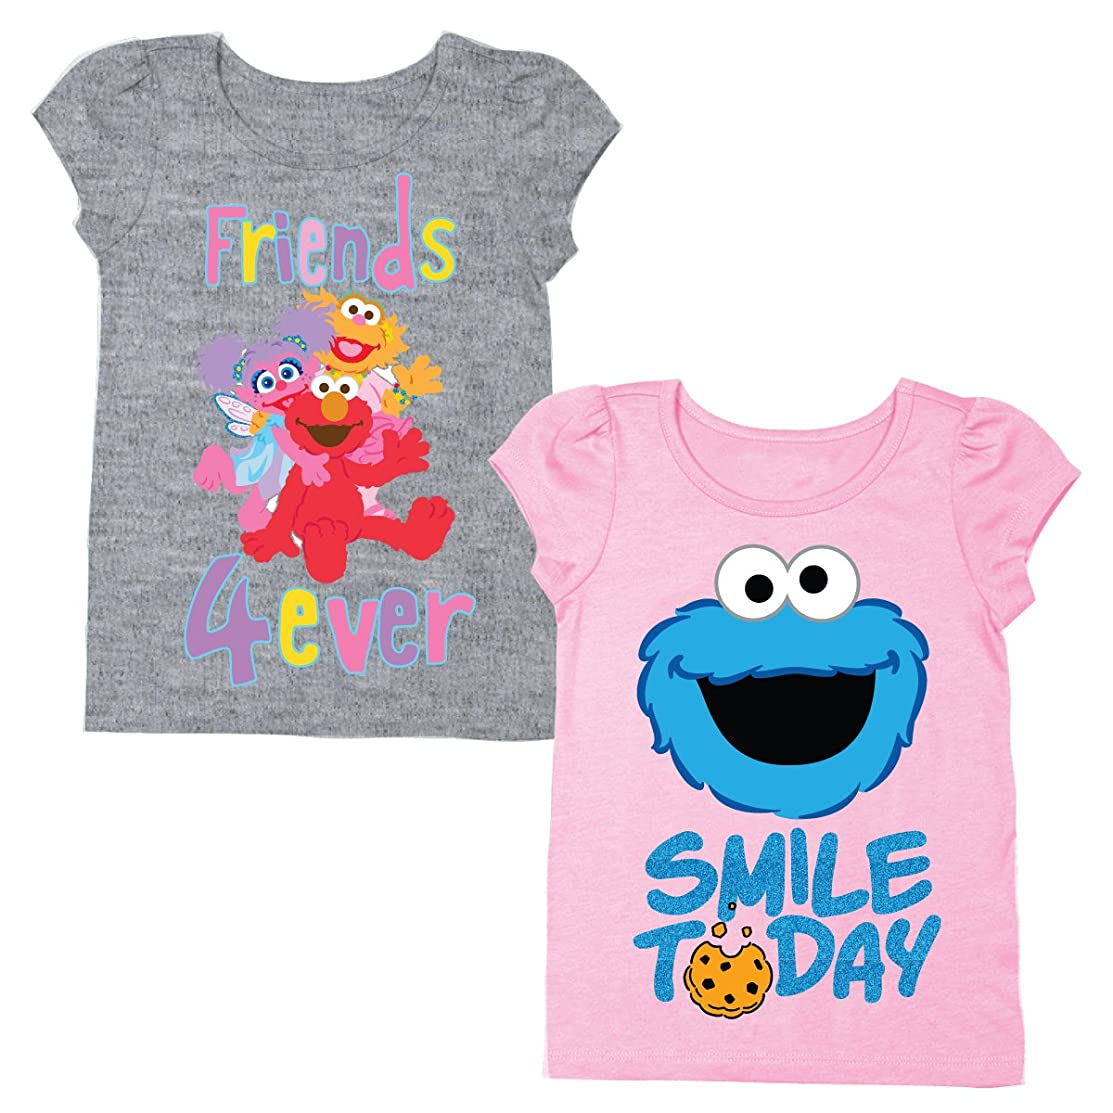 Sesame Street Short Sleeve Shirt – 2 Pack of Sesame Street Tees – Elmo, Cookie Monster & Others!